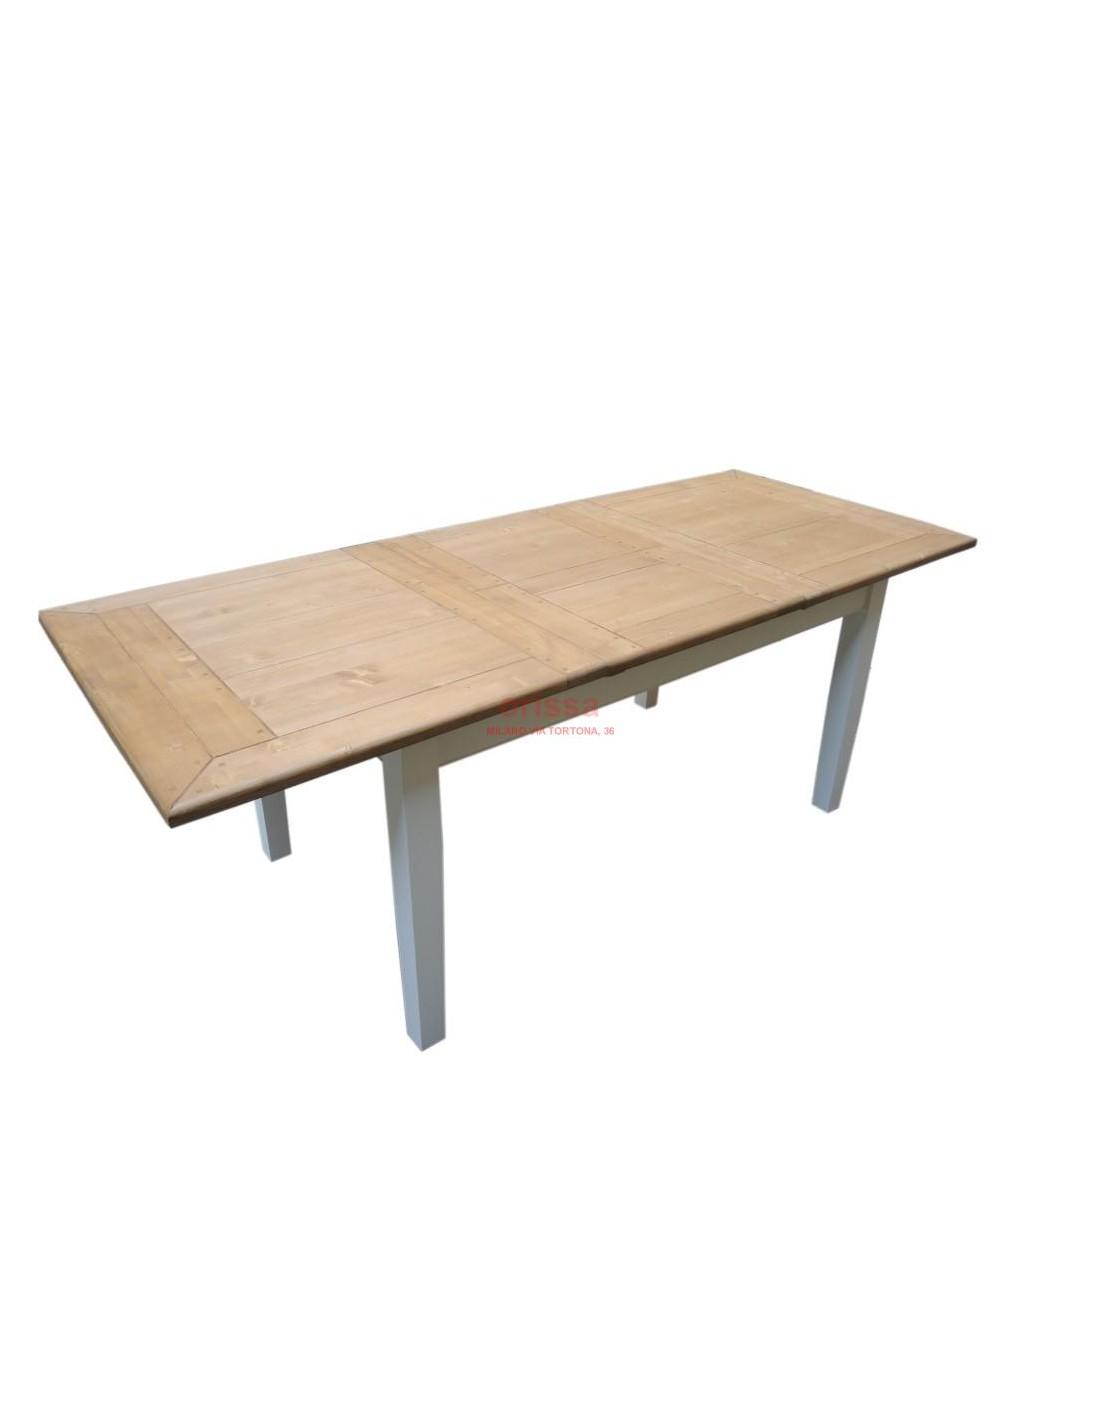 Tavolo allungabile con prolunga a scomparsa oms224 for Prolunga tavolo